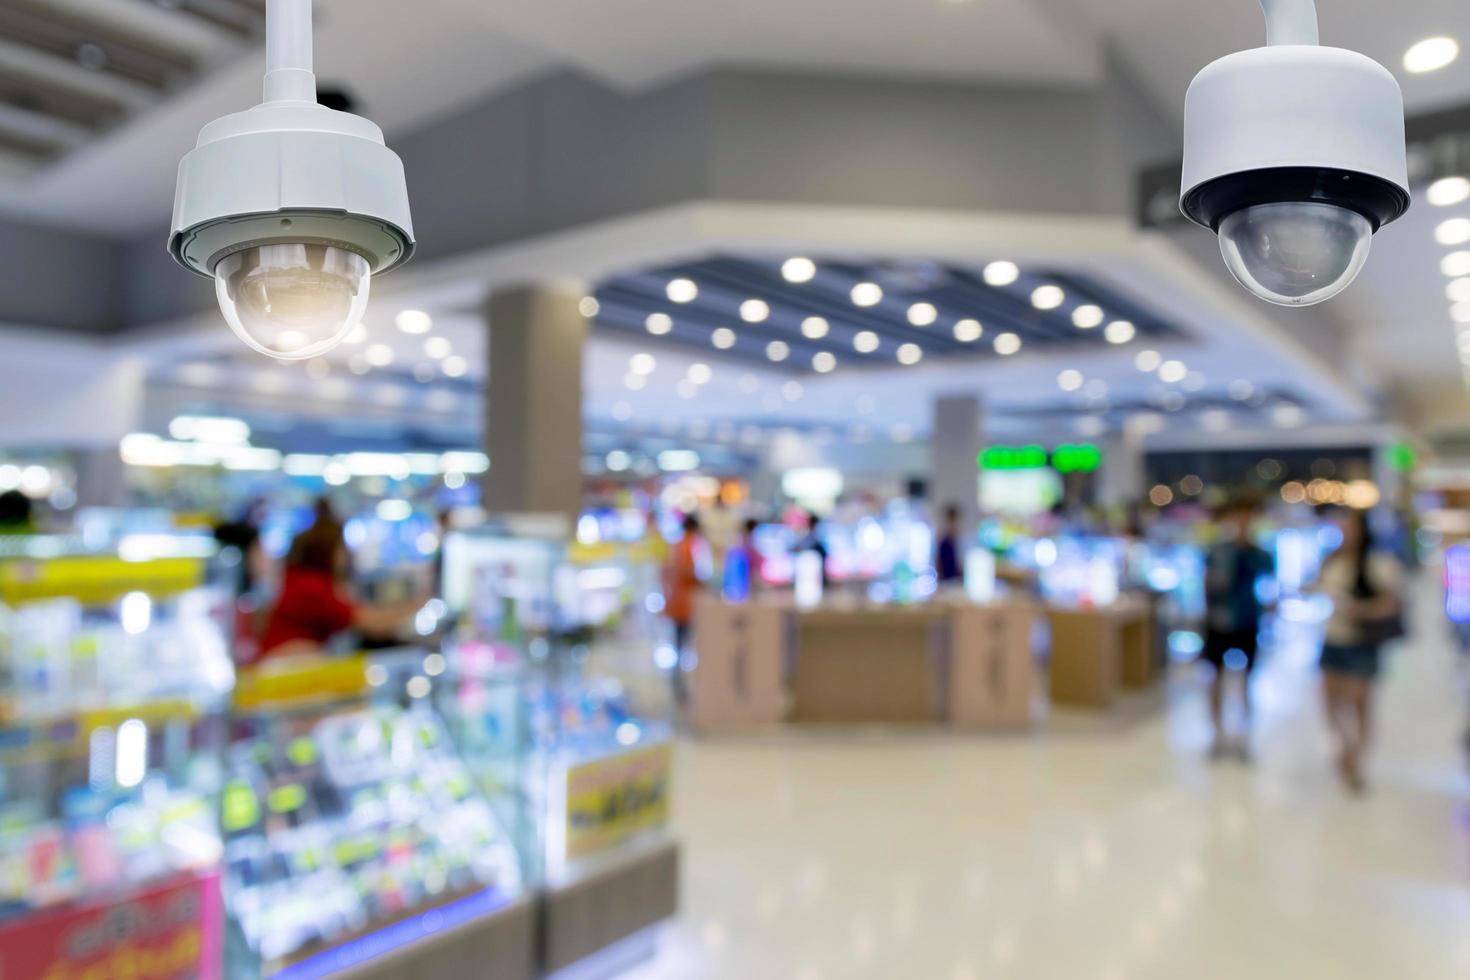 CCTV-Überwachungskamera foto